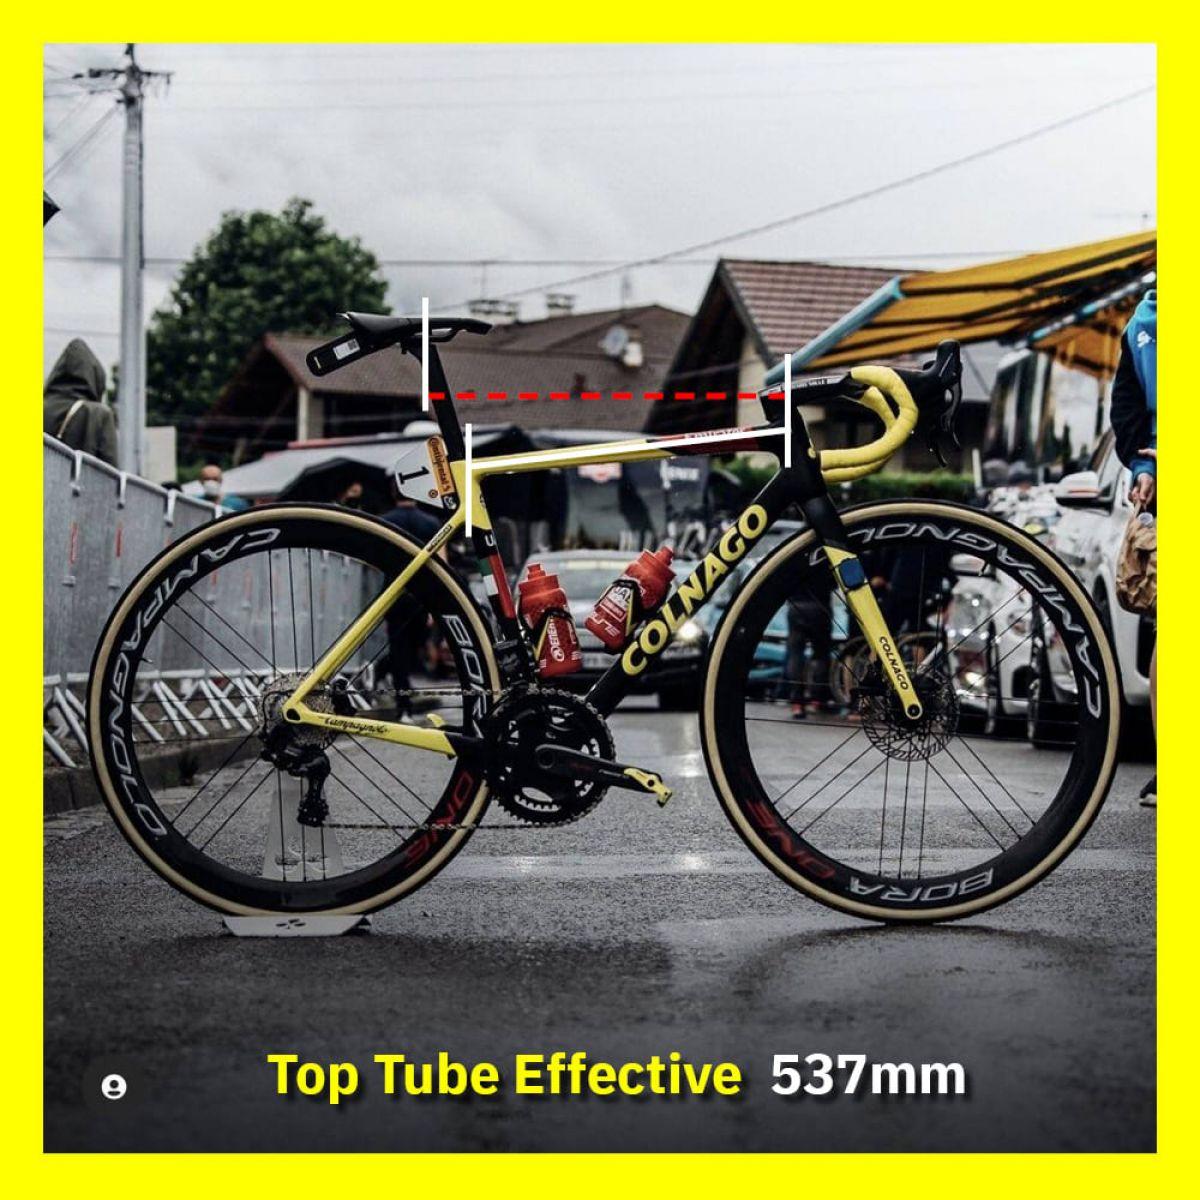 Top_Tube_Effective_537_mm